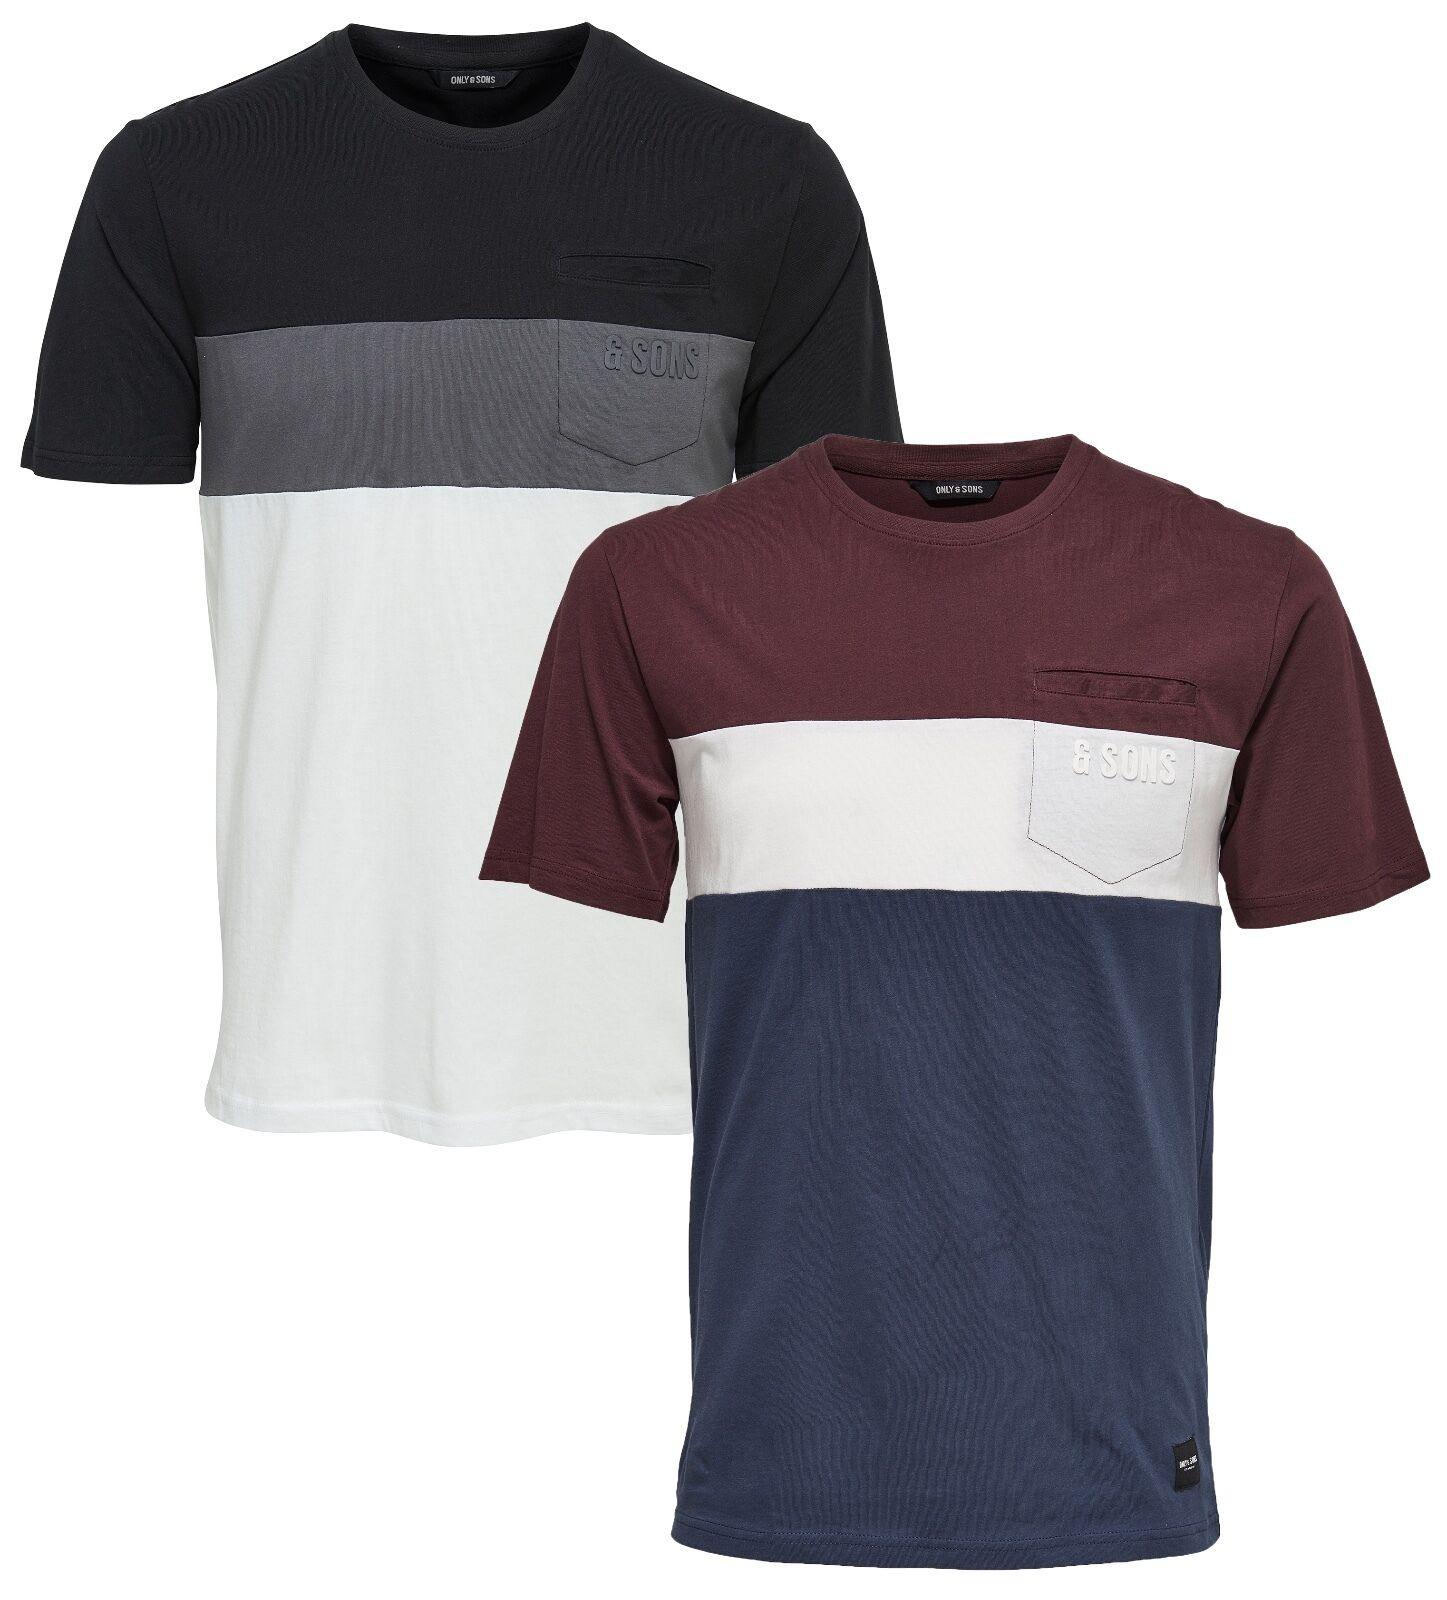 Sons New Men's Contrast Anatolie Stripe Mono Fashion Cotton T-shirt Top